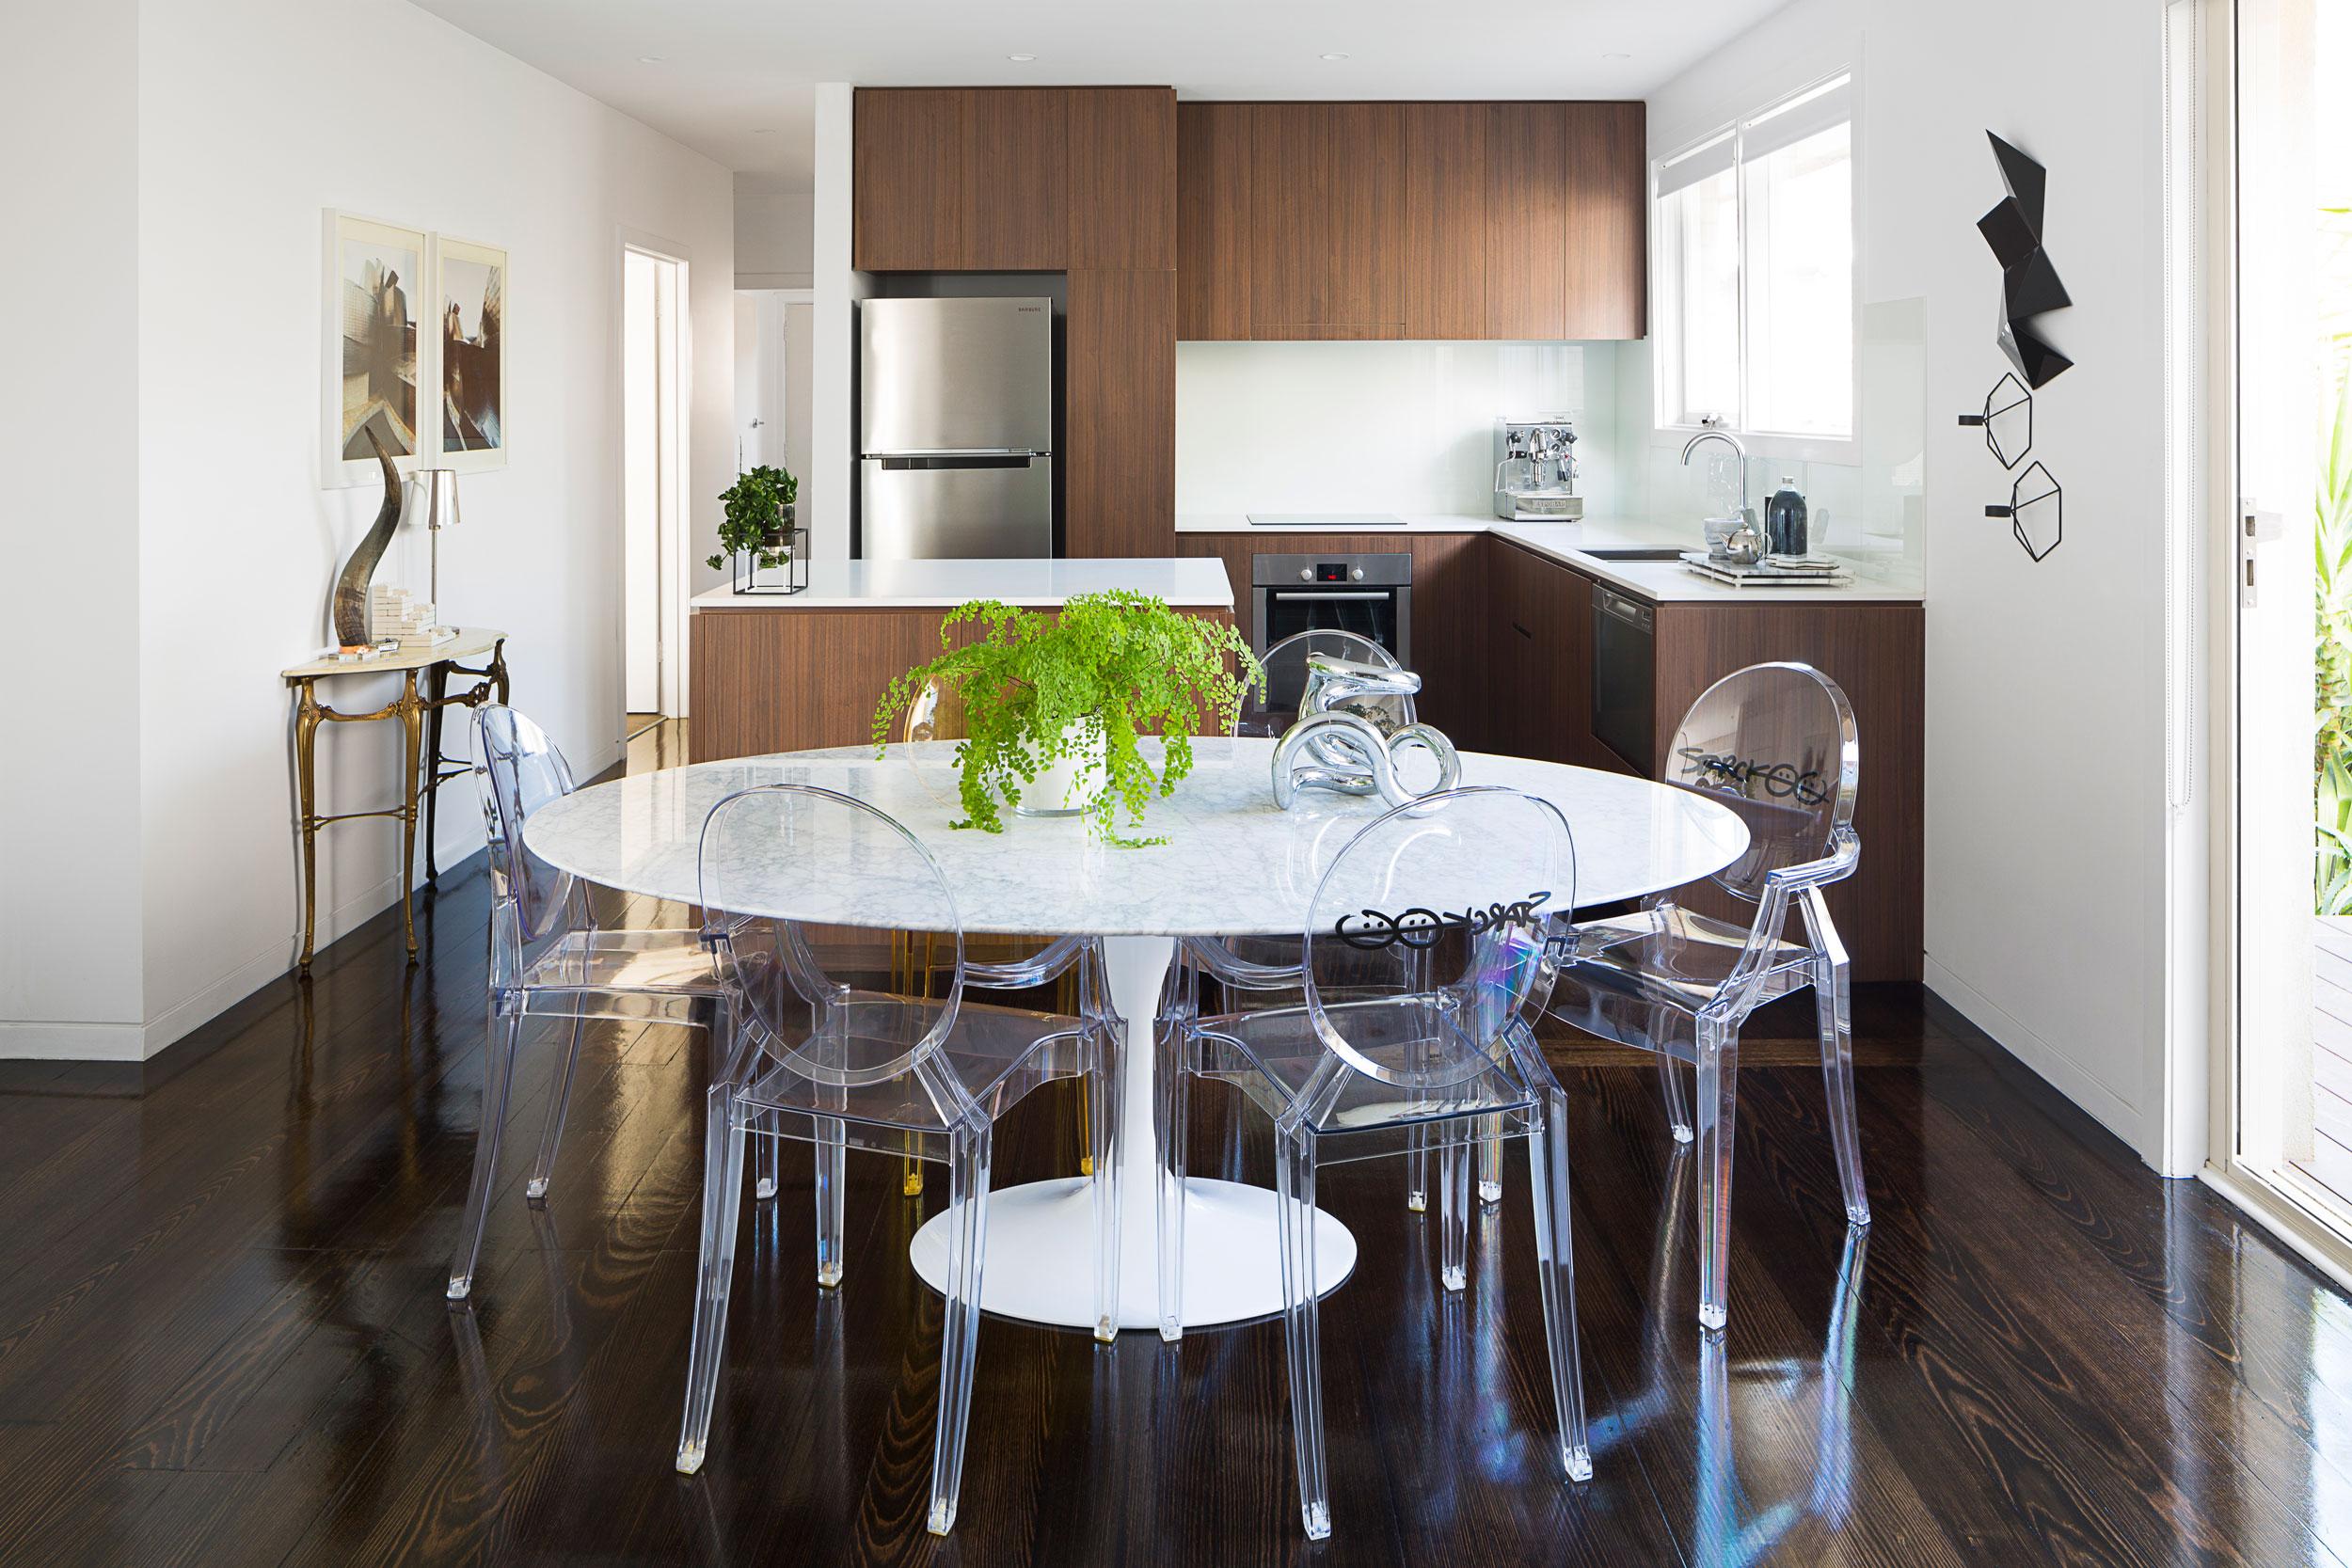 Sarah_Anderson_Photography_SWG_Studio_kitchen